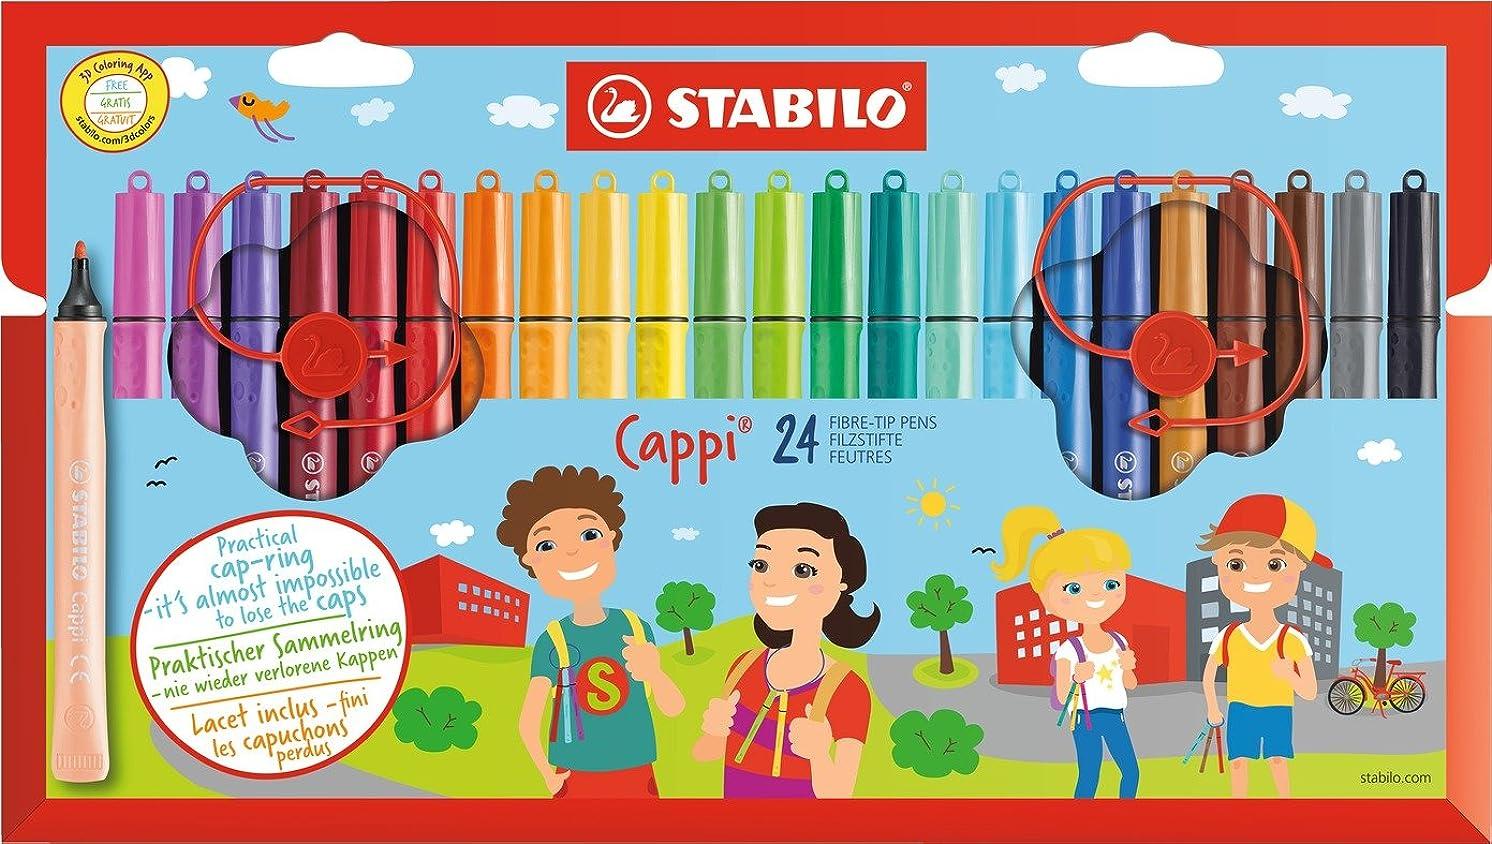 STABILO Cappi Felt-Tip Pen Wallet of 24